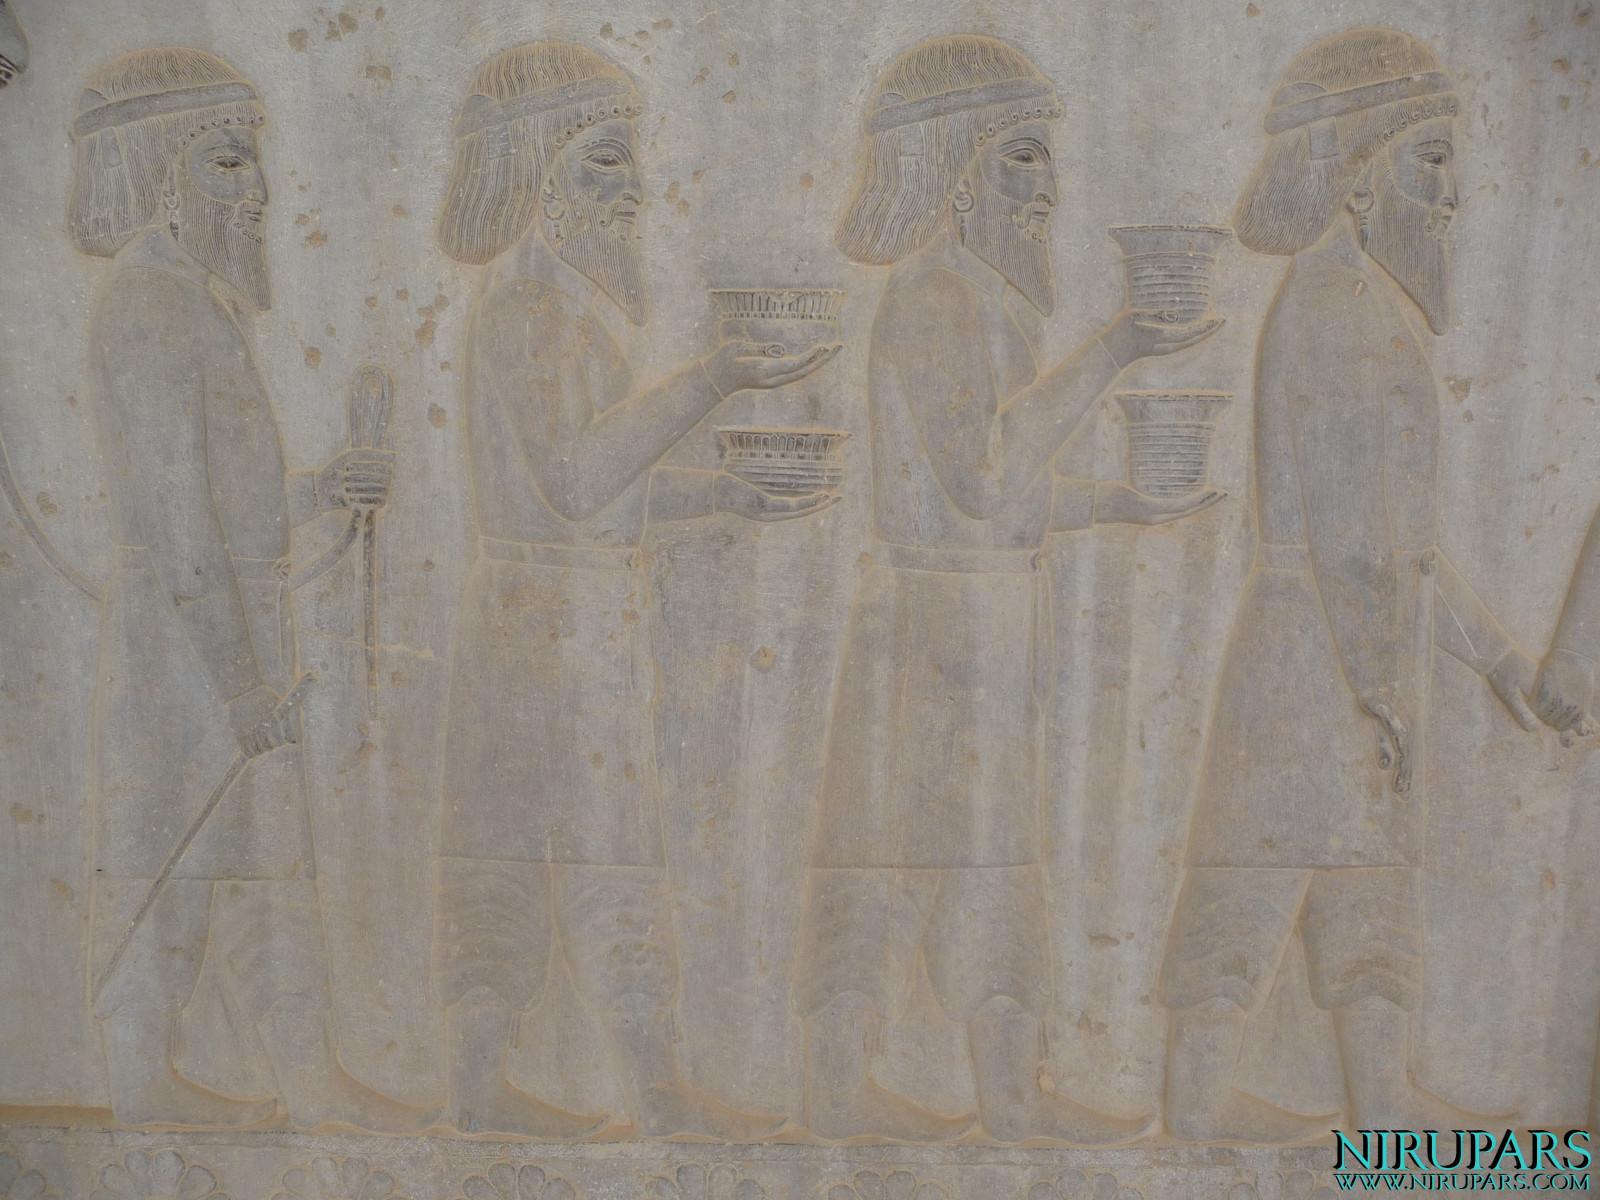 Persepolis - Apadana - East Portico - Delegation Drangiana Arachosia